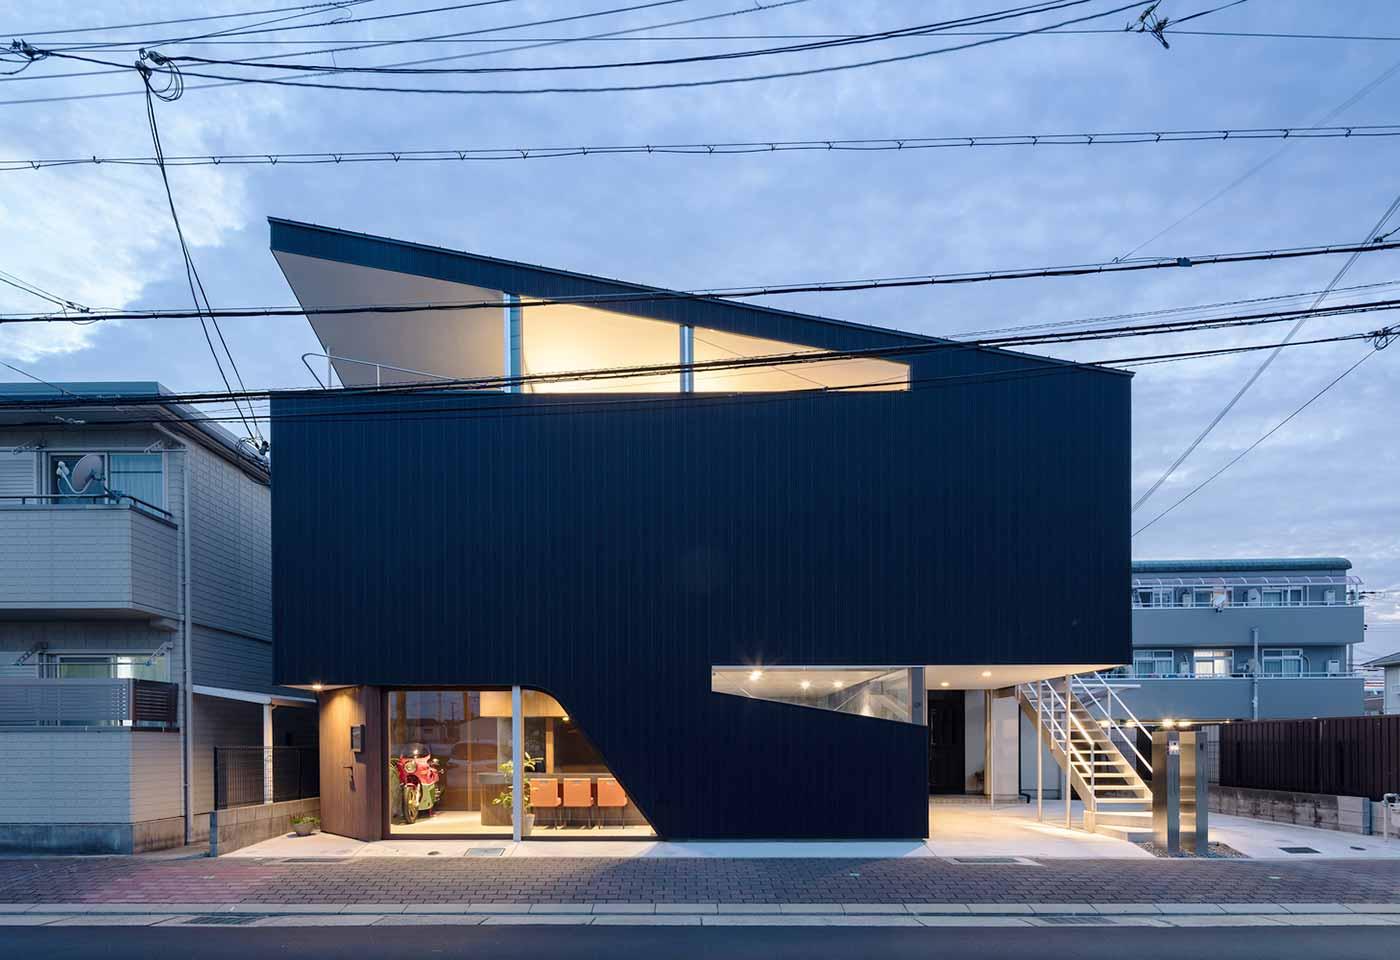 Desain Unik Arsitektur Rumah Kontemporer dengan Salon Mini | Foto artikel Arsitag